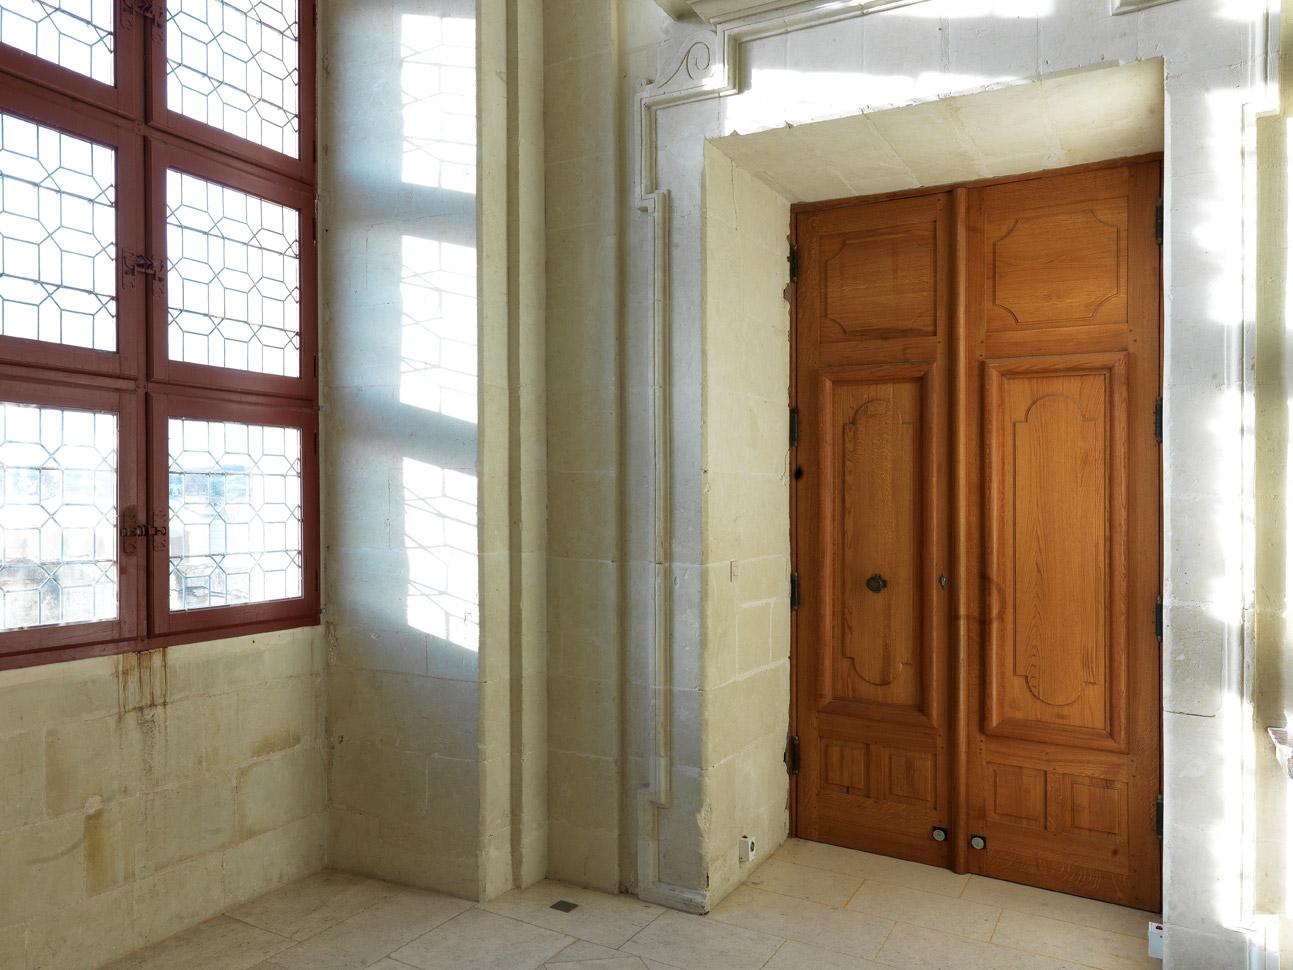 Great 970 #9F612C Traditional Interior Doors Asselin Inc Image Interior French Doors  Atlanta 28031293